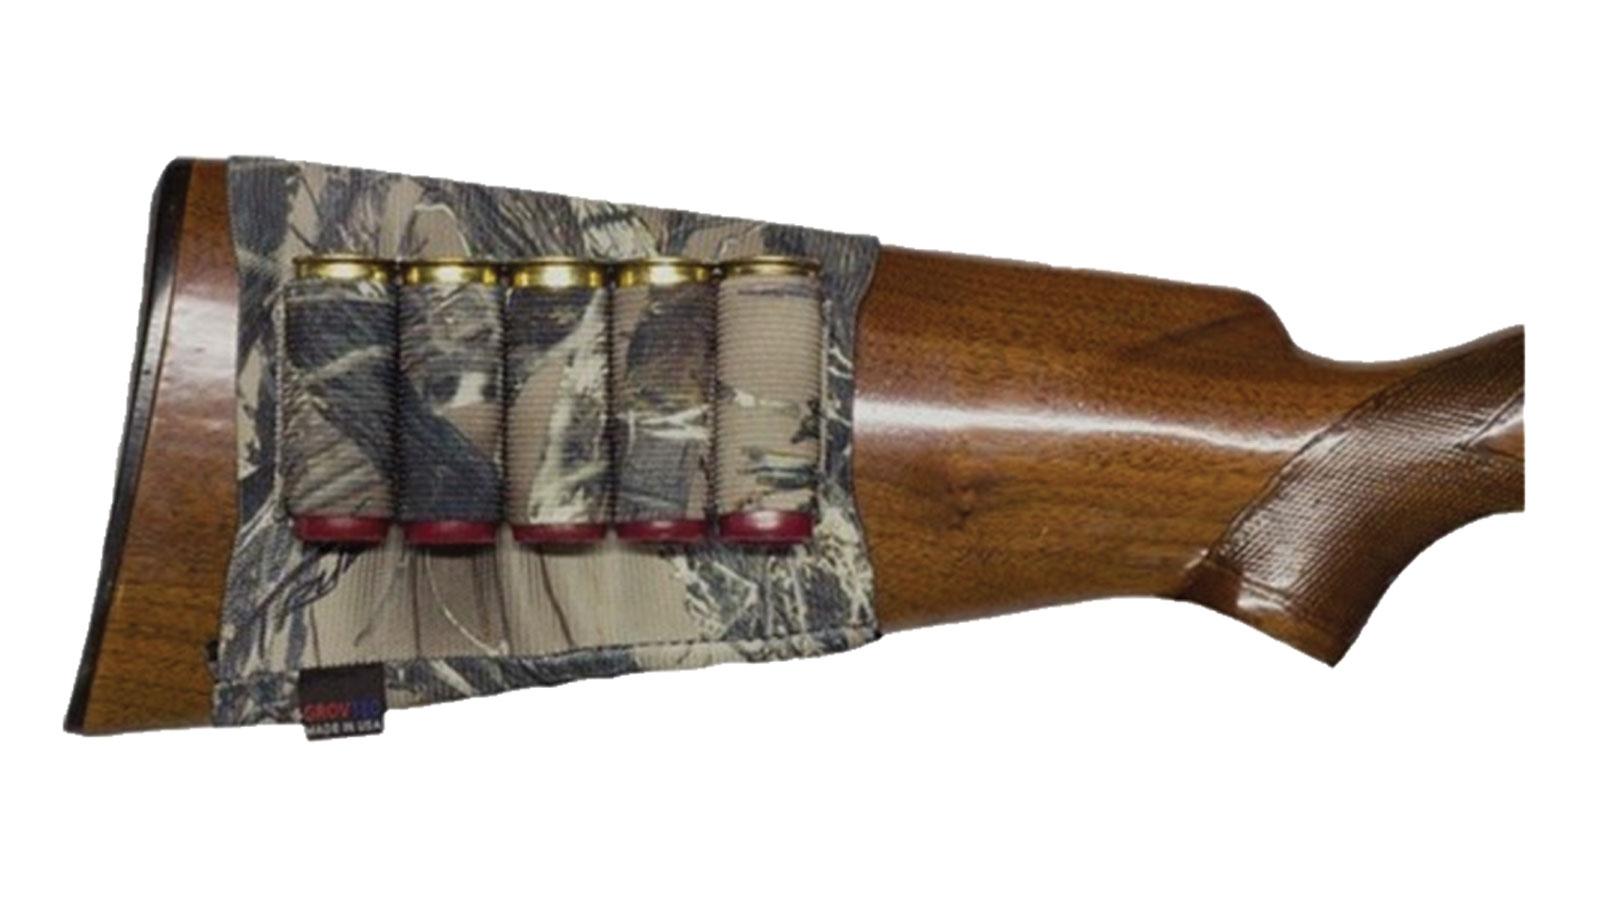 P320-M17 9mm 4 7 17 Round Coyote / Black Sig Sauer 320F-9-RT